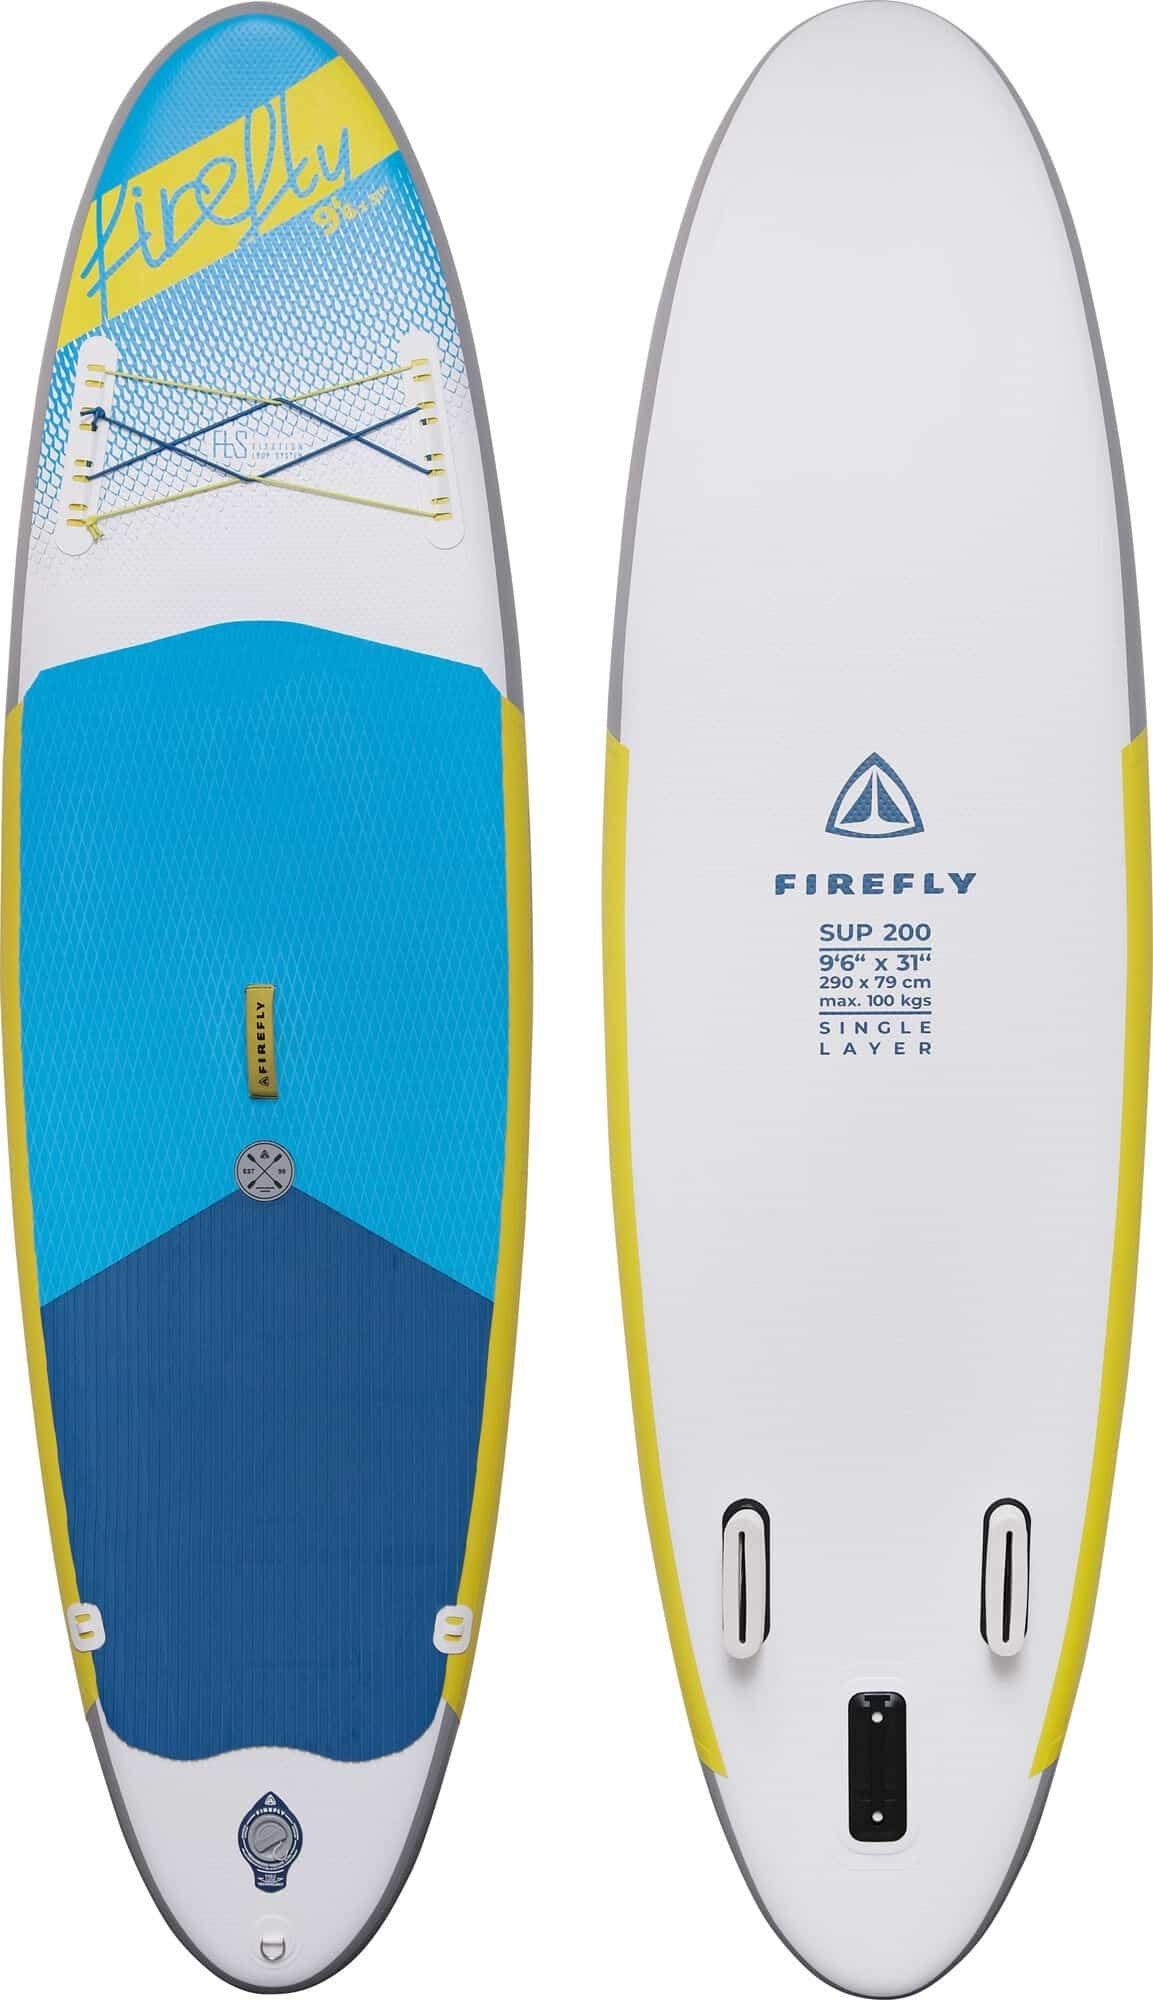 Firefly ISUP 200 II Stand Up Paddle Set